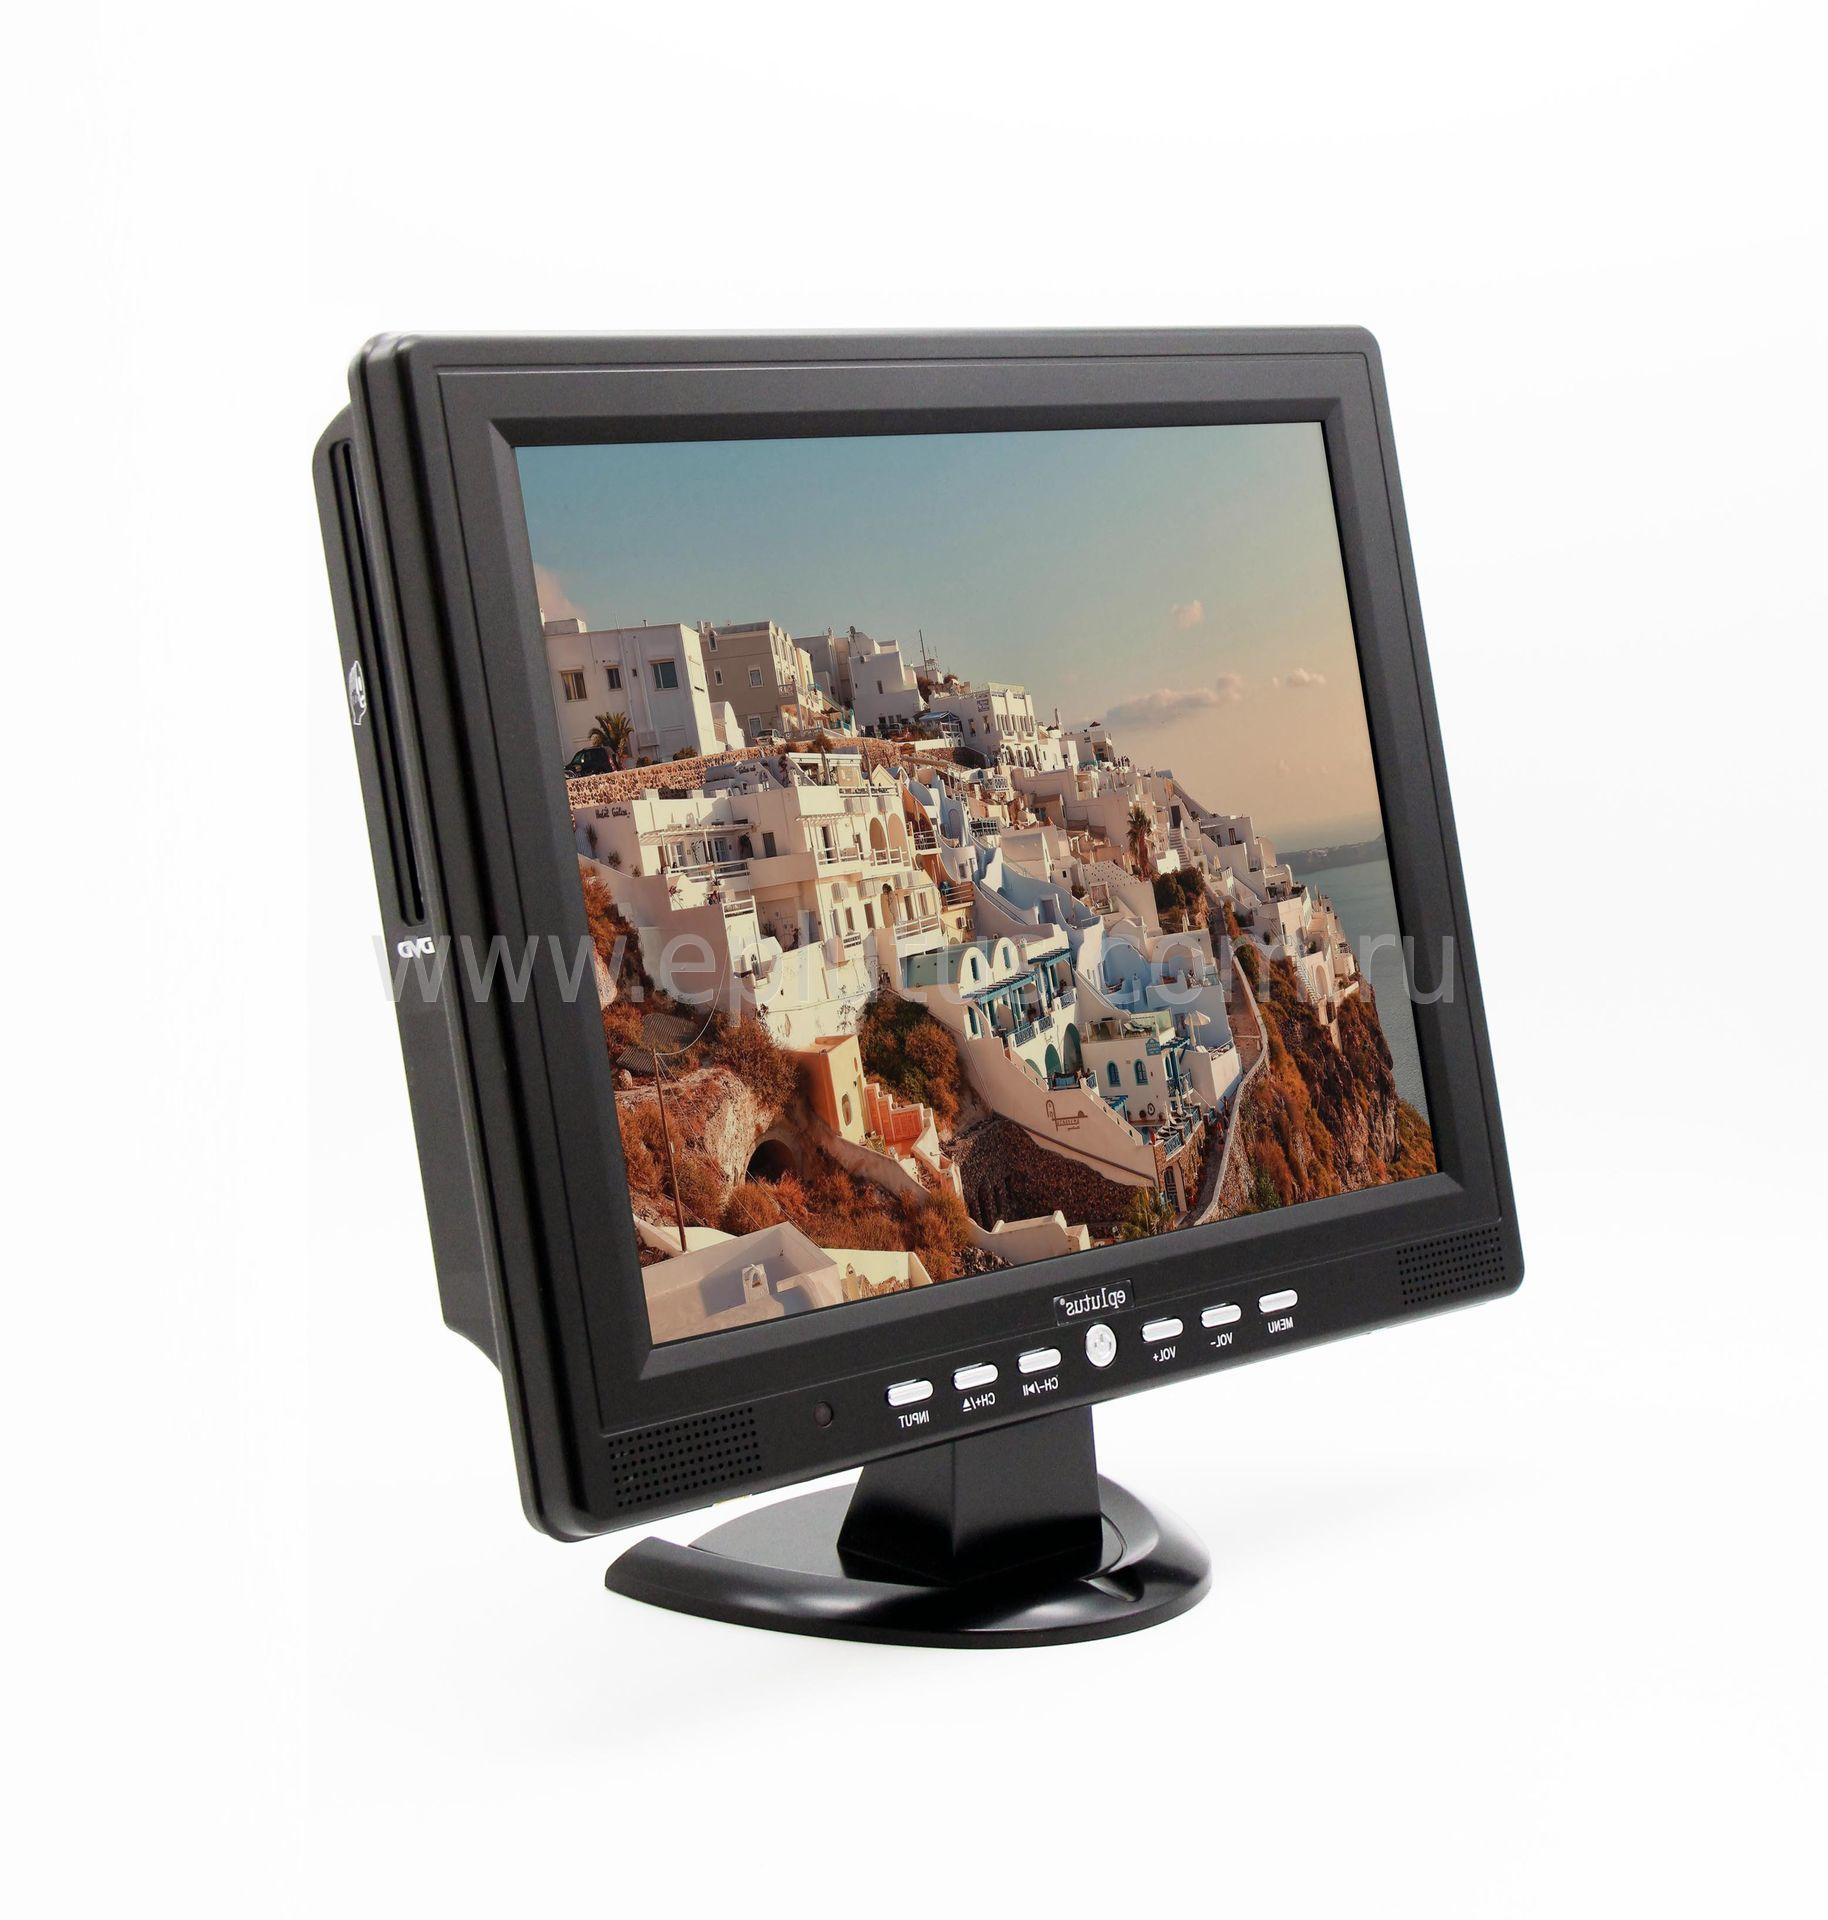 Автомобильный телевизор Eplutus EP-1515T телевизор либертон